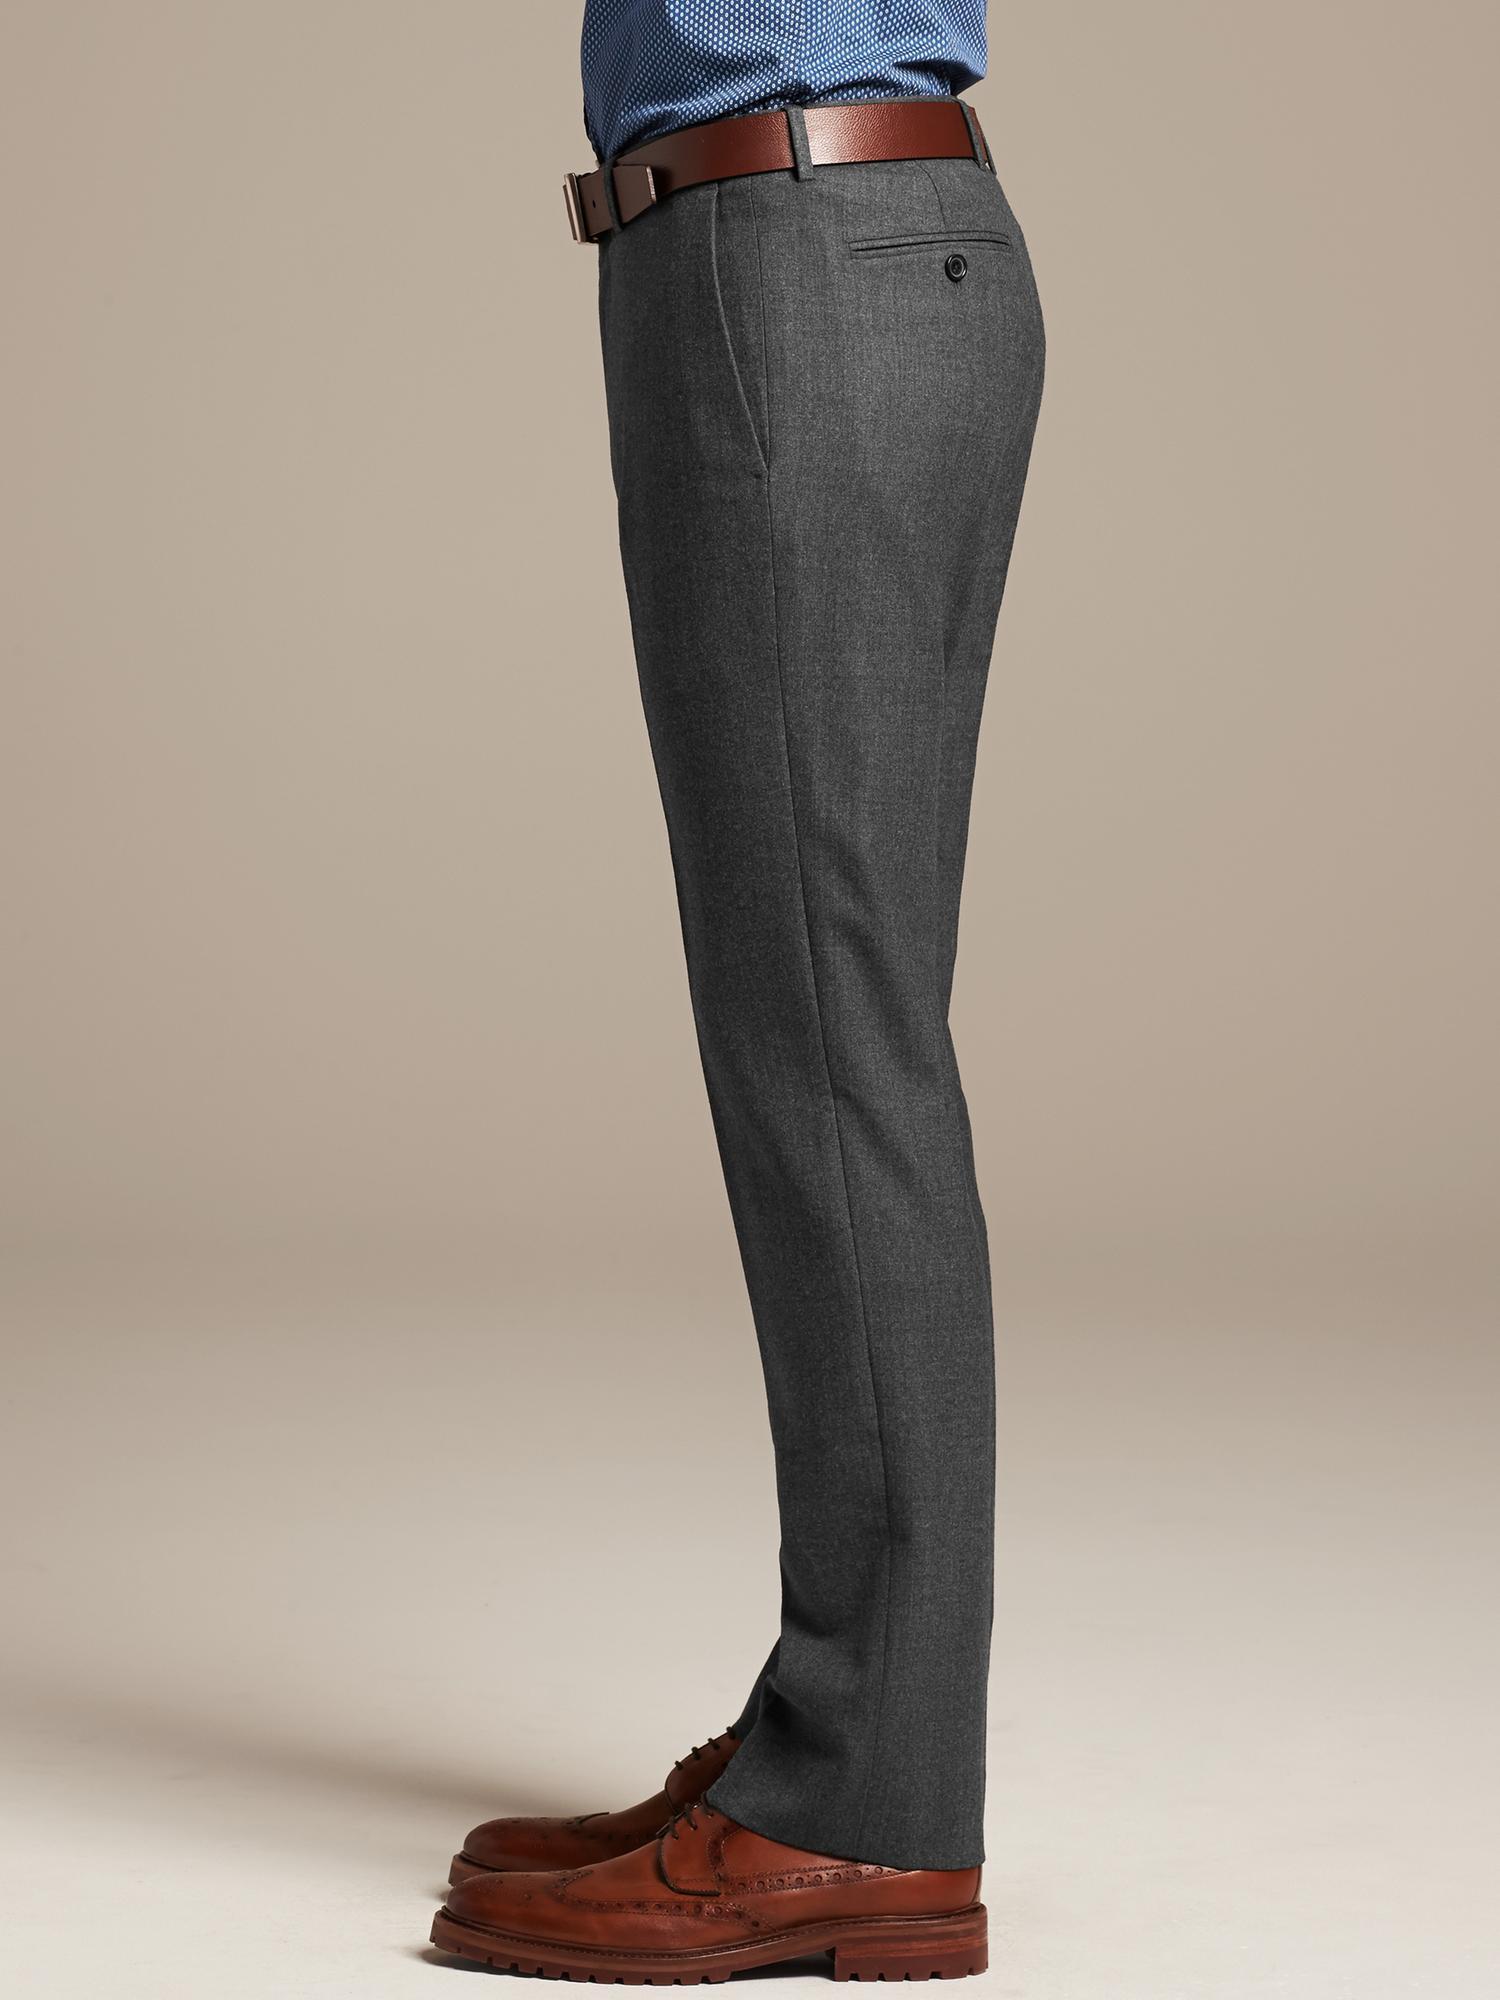 banana-republic-gray-tailored-slim-fit-flannel-dress-pant-medium-gray-heather-product-1-22186526-0-558779545-normal.jpeg